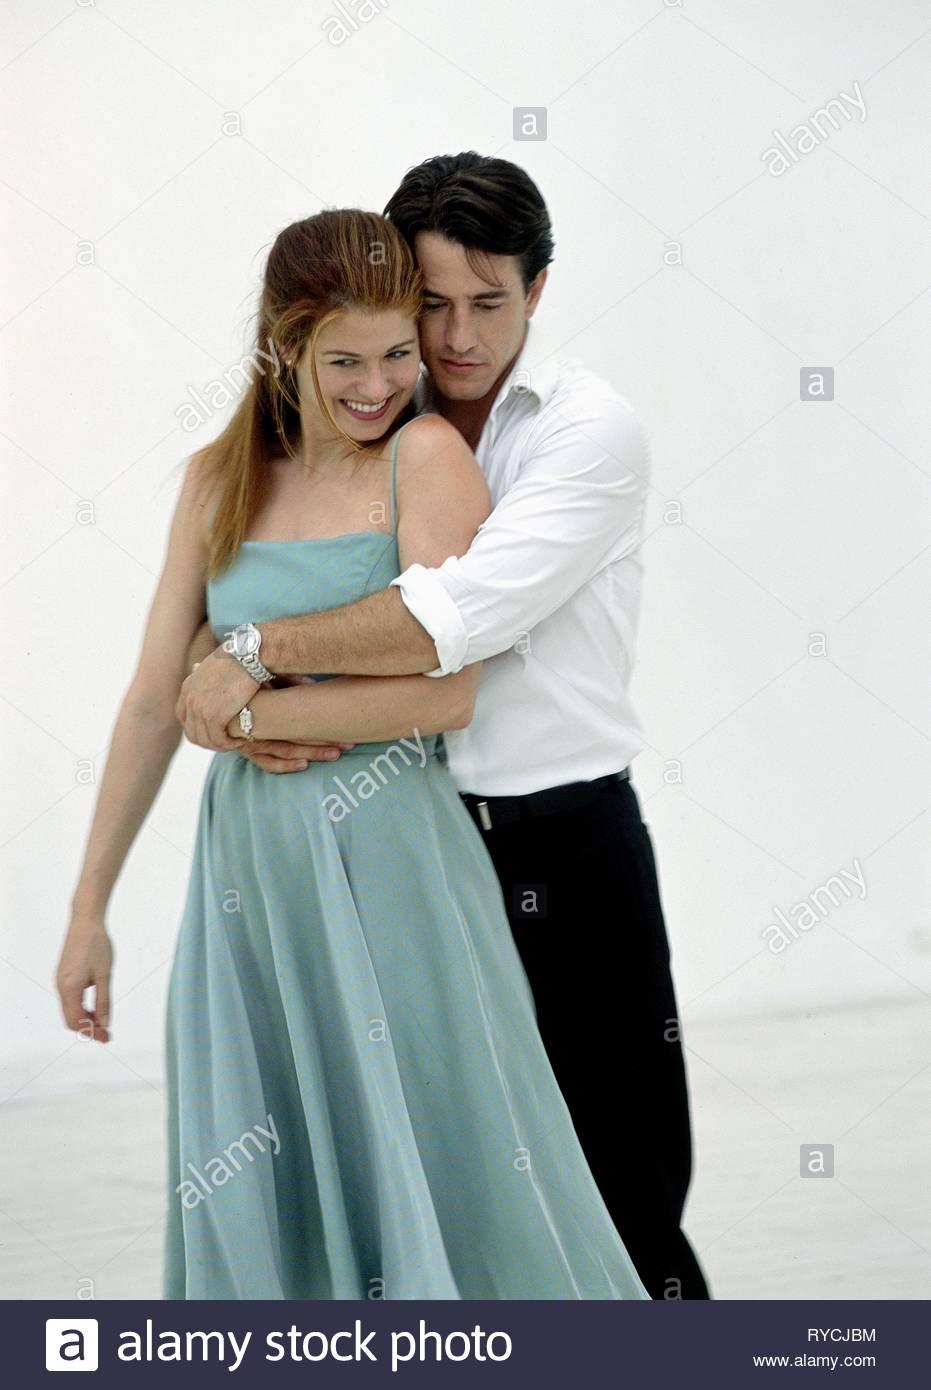 DEBRA MESSING, DERMOT MULRONEY, THE WEDDING DATE, 2005 - Stock Image